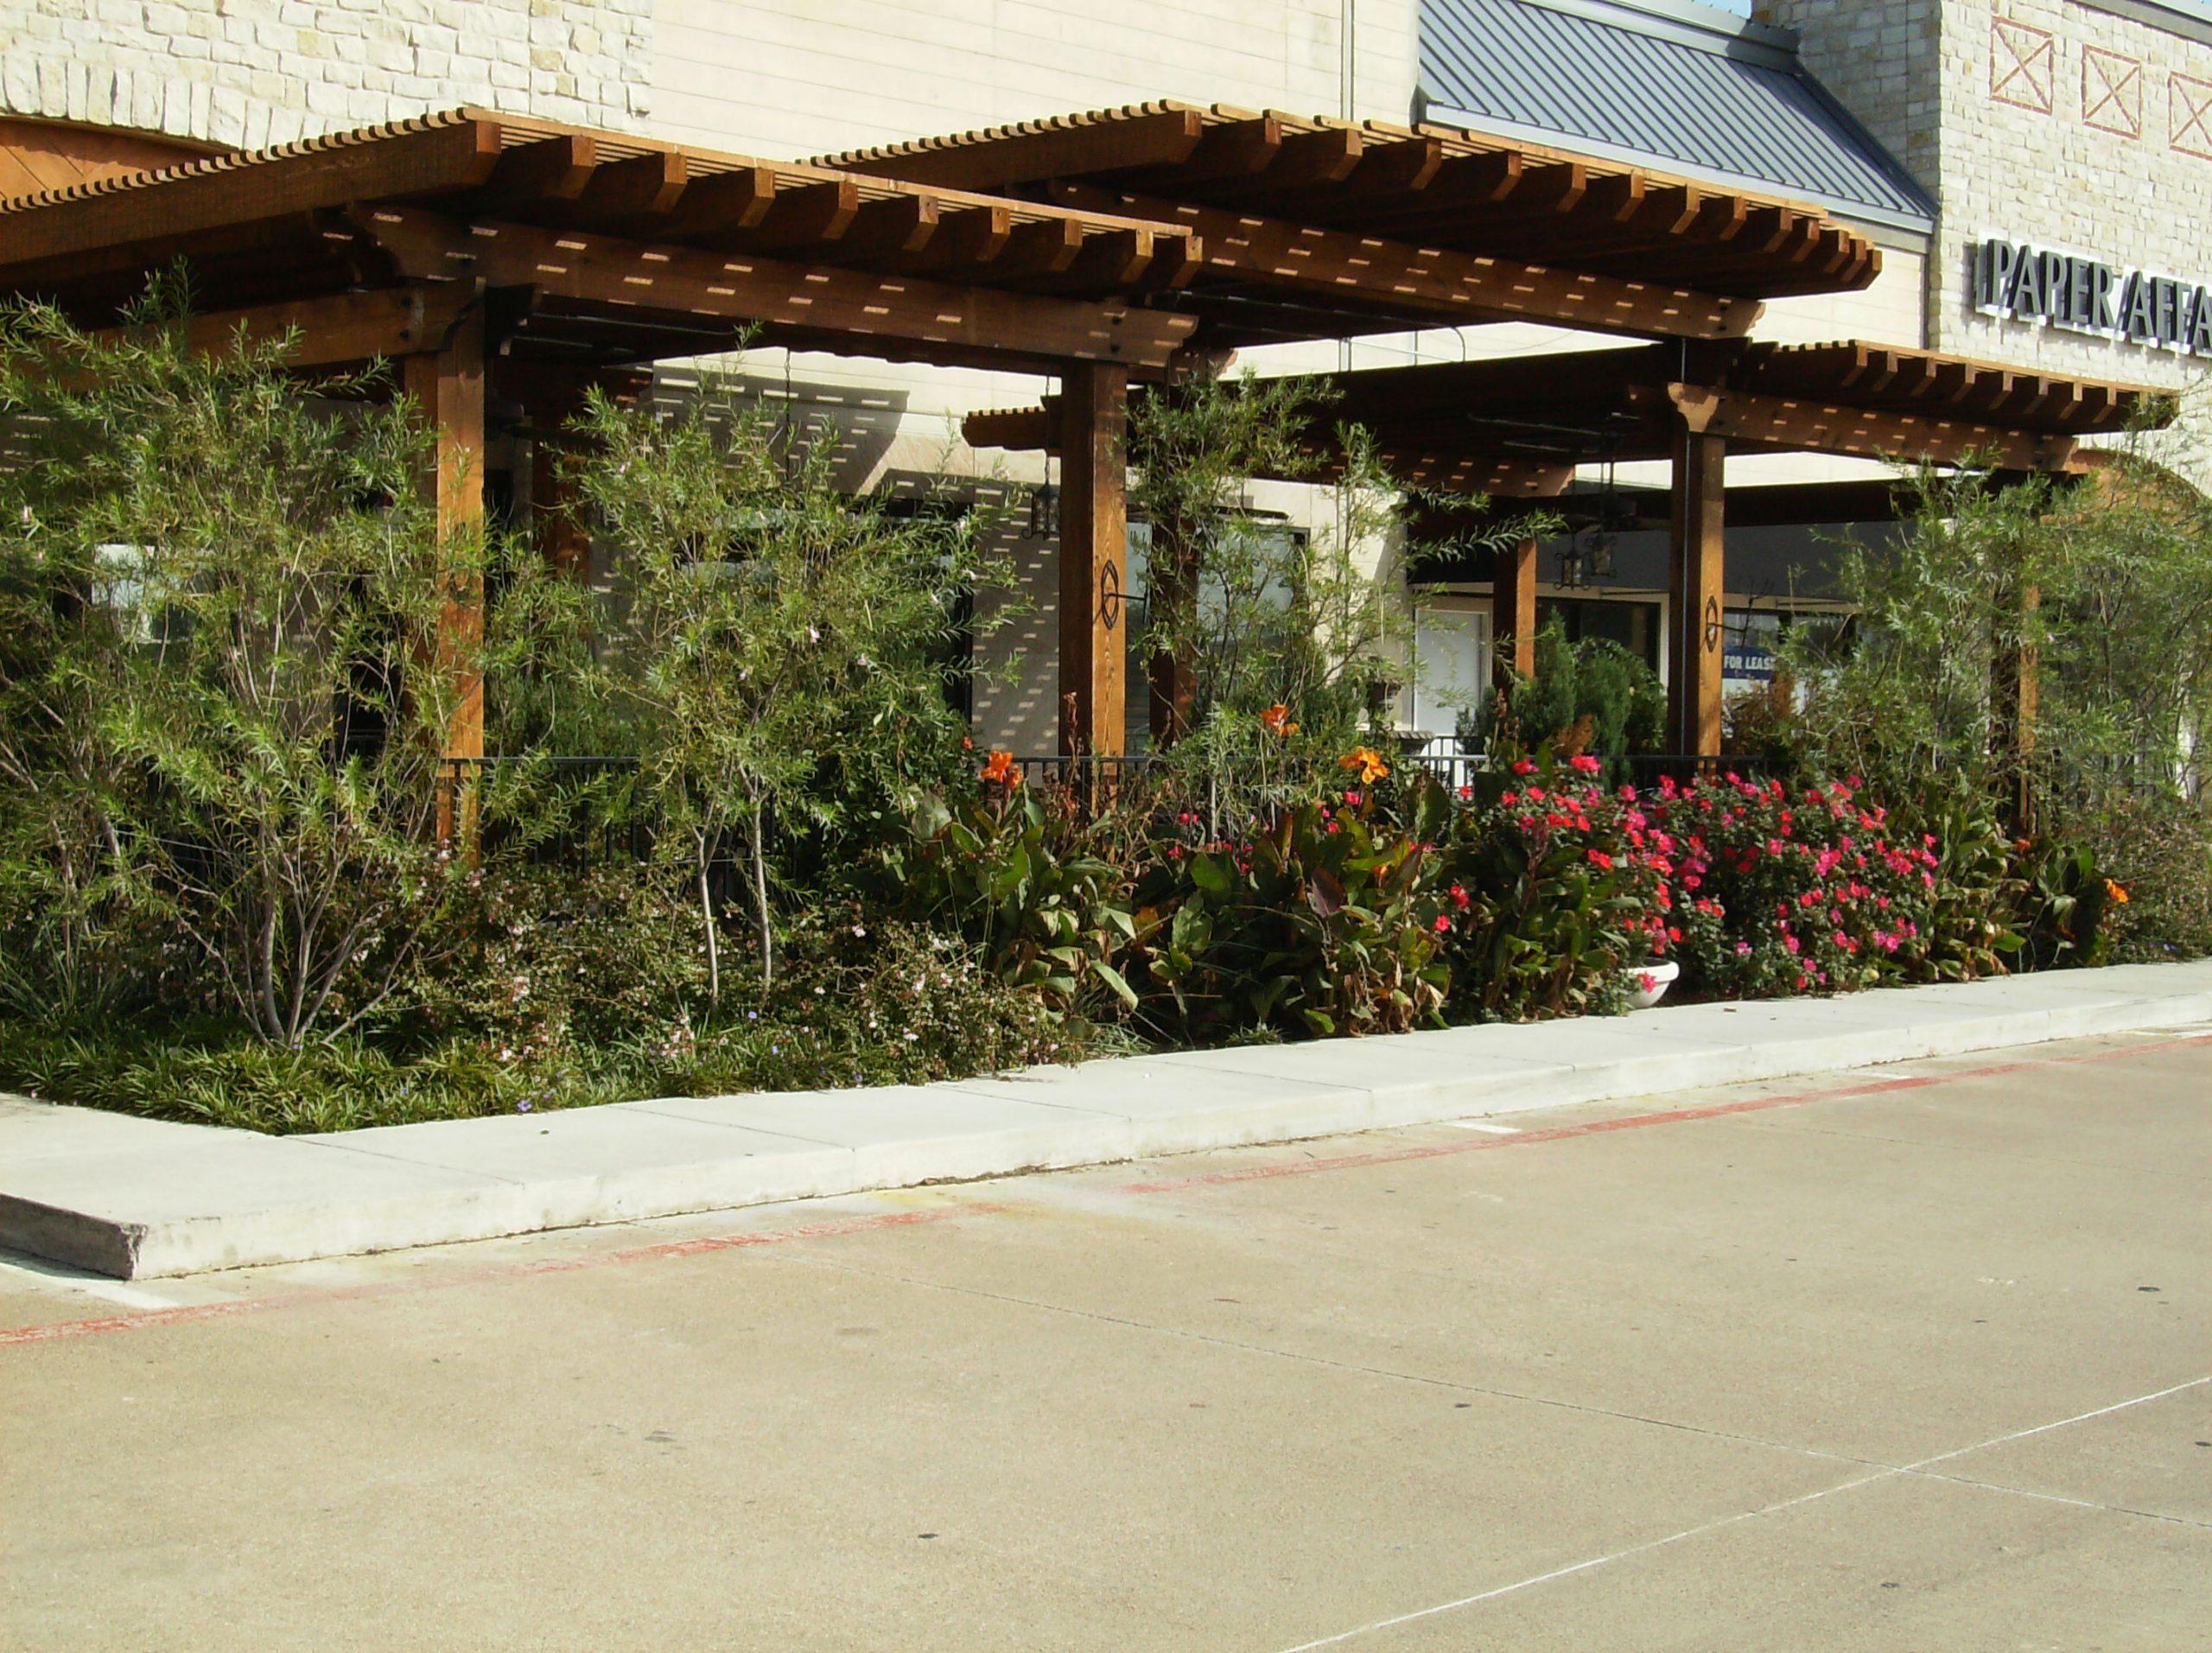 Pergolas & Gazebos - Primo Outdoor Living on Primo Outdoor Living  id=60861